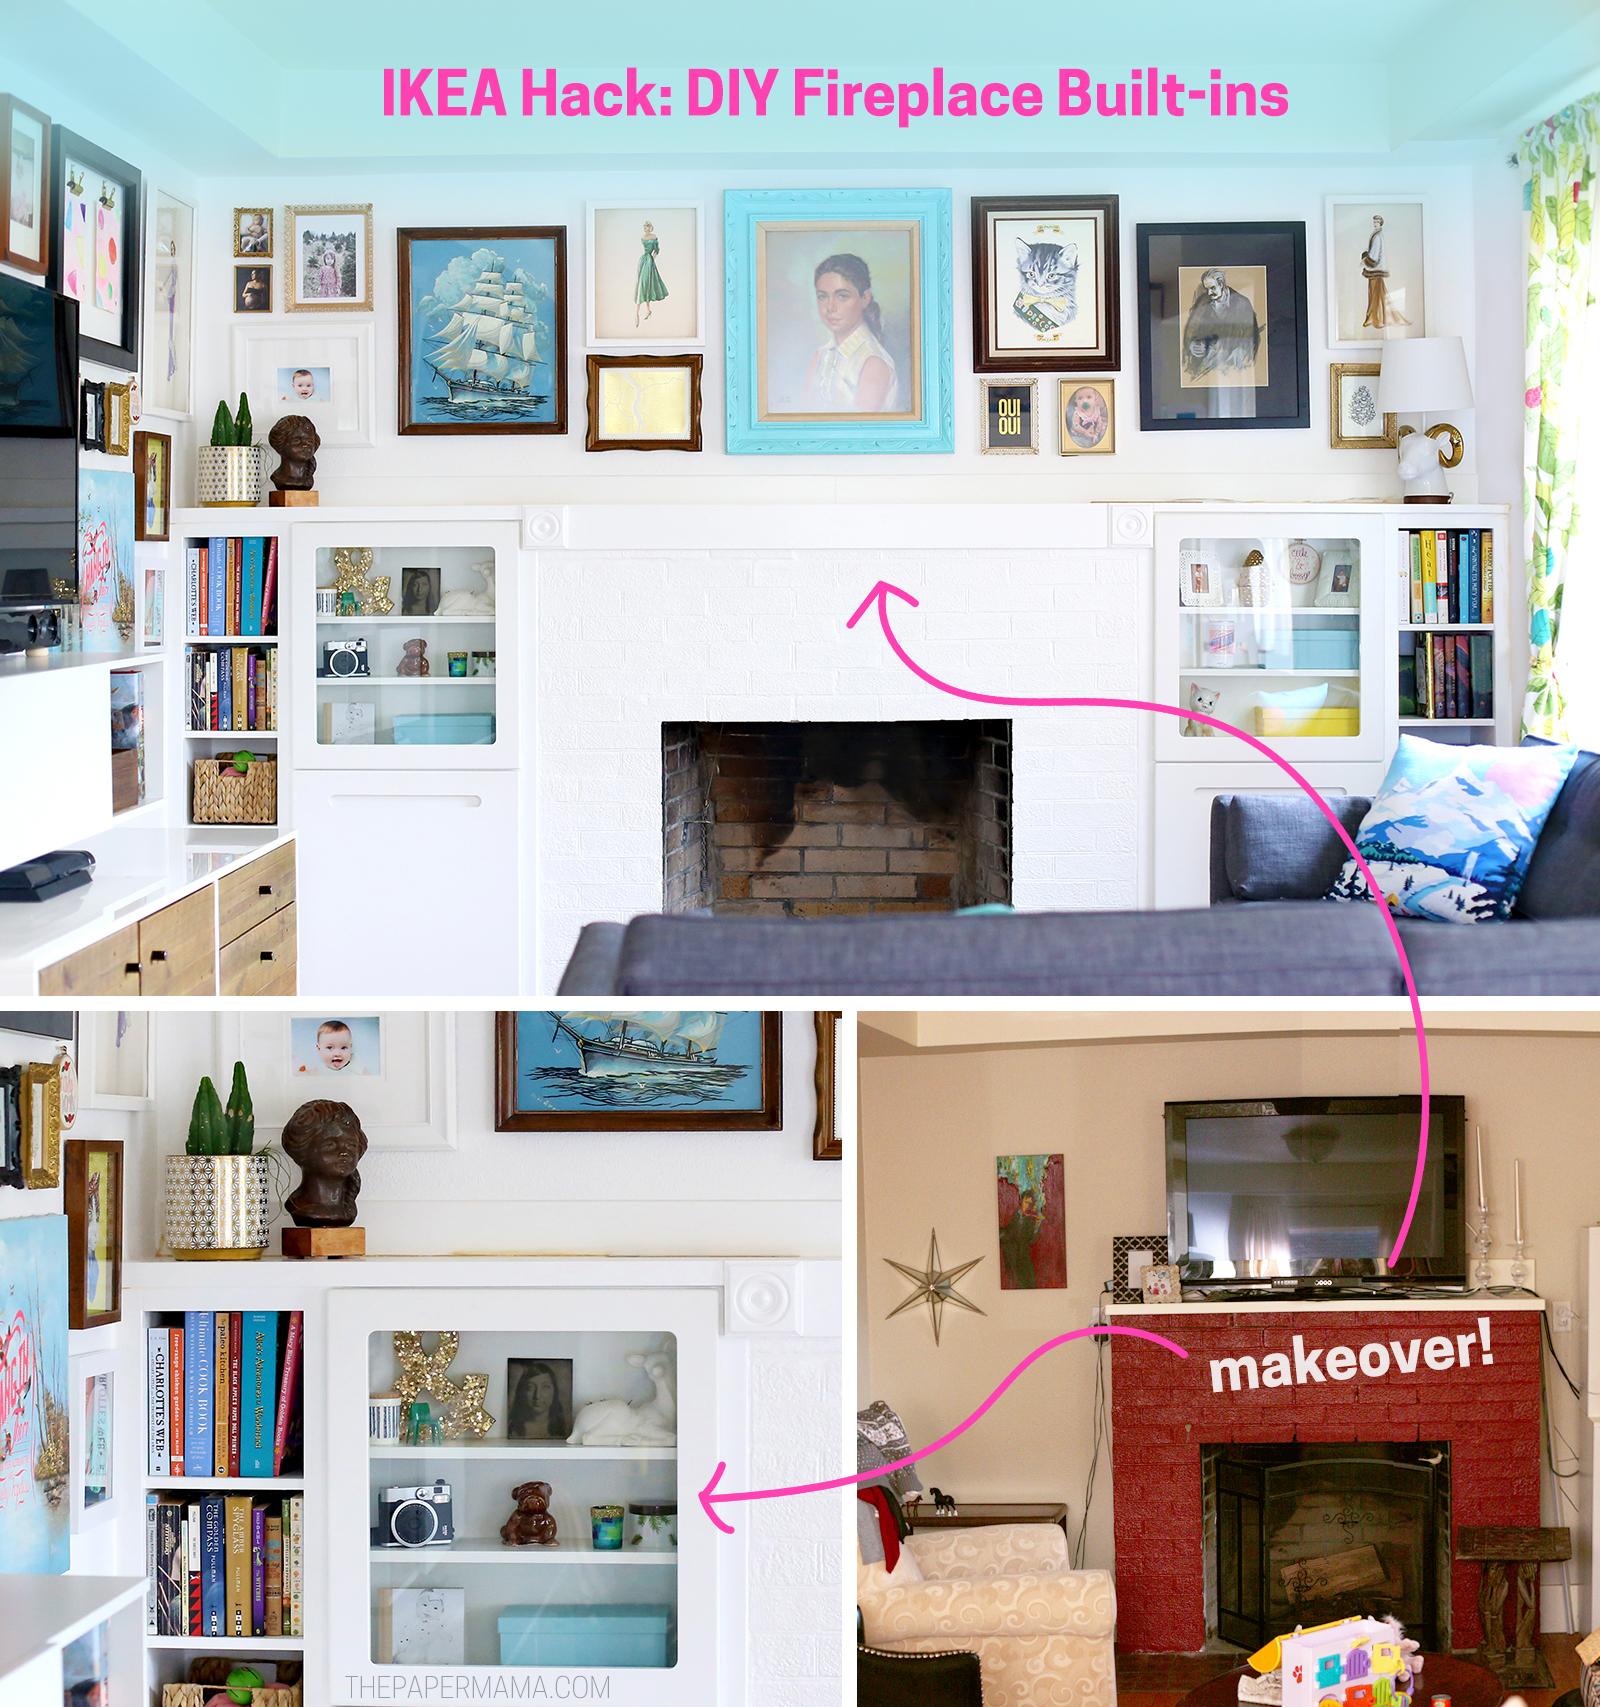 IKEA Hack: DIY Fireplace Built-ins